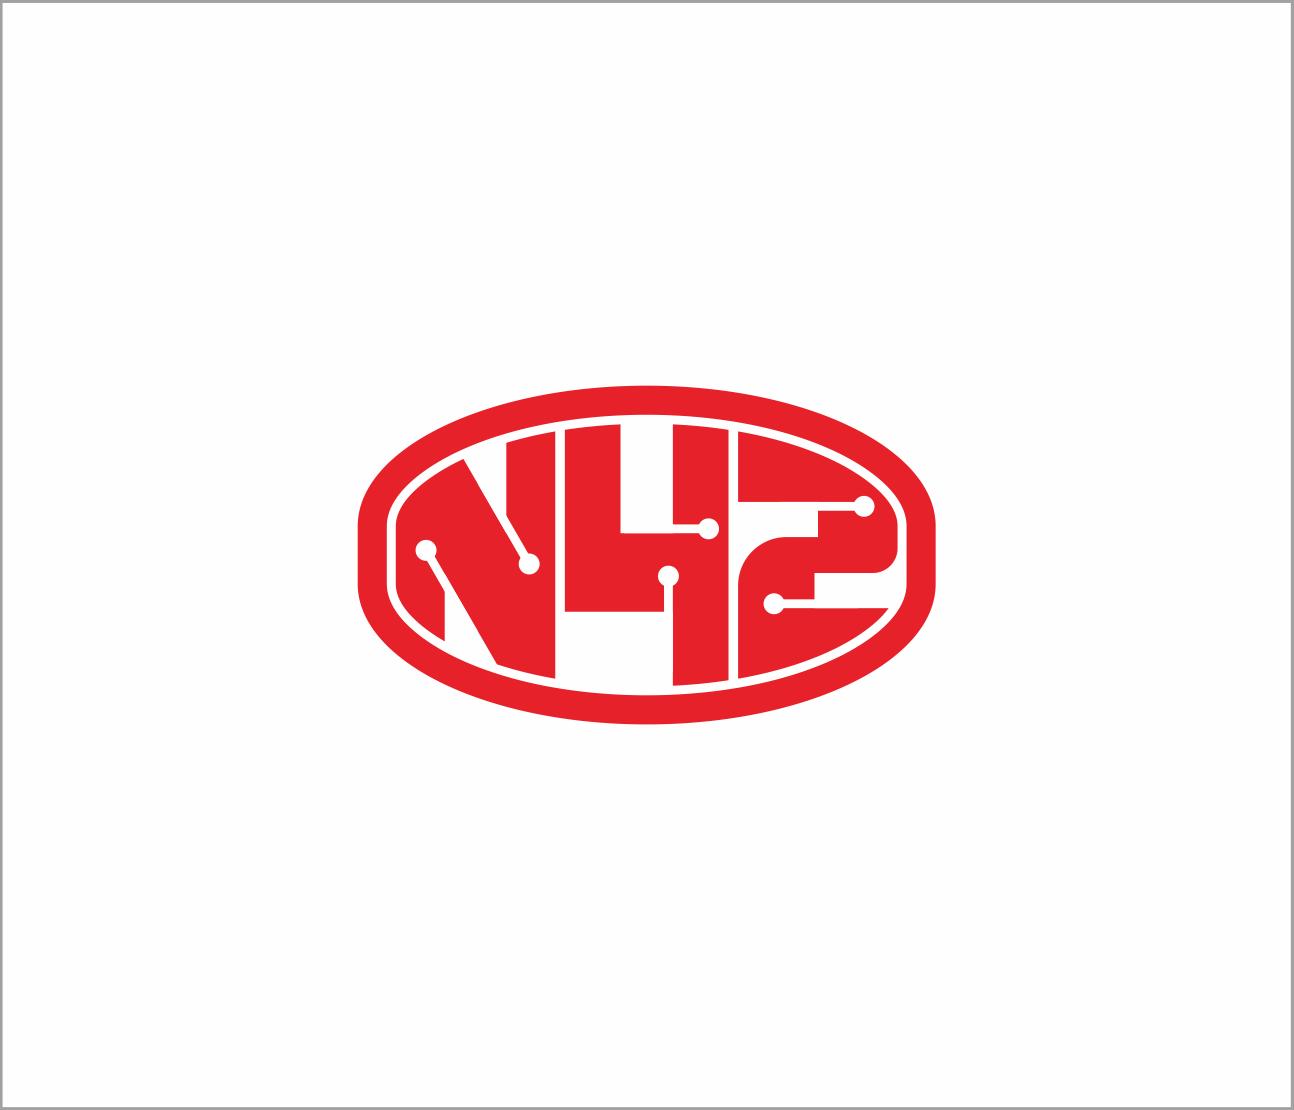 Logo Design by Armada Jamaluddin - Entry No. 119 in the Logo Design Contest Artistic Logo Design for Number 42.